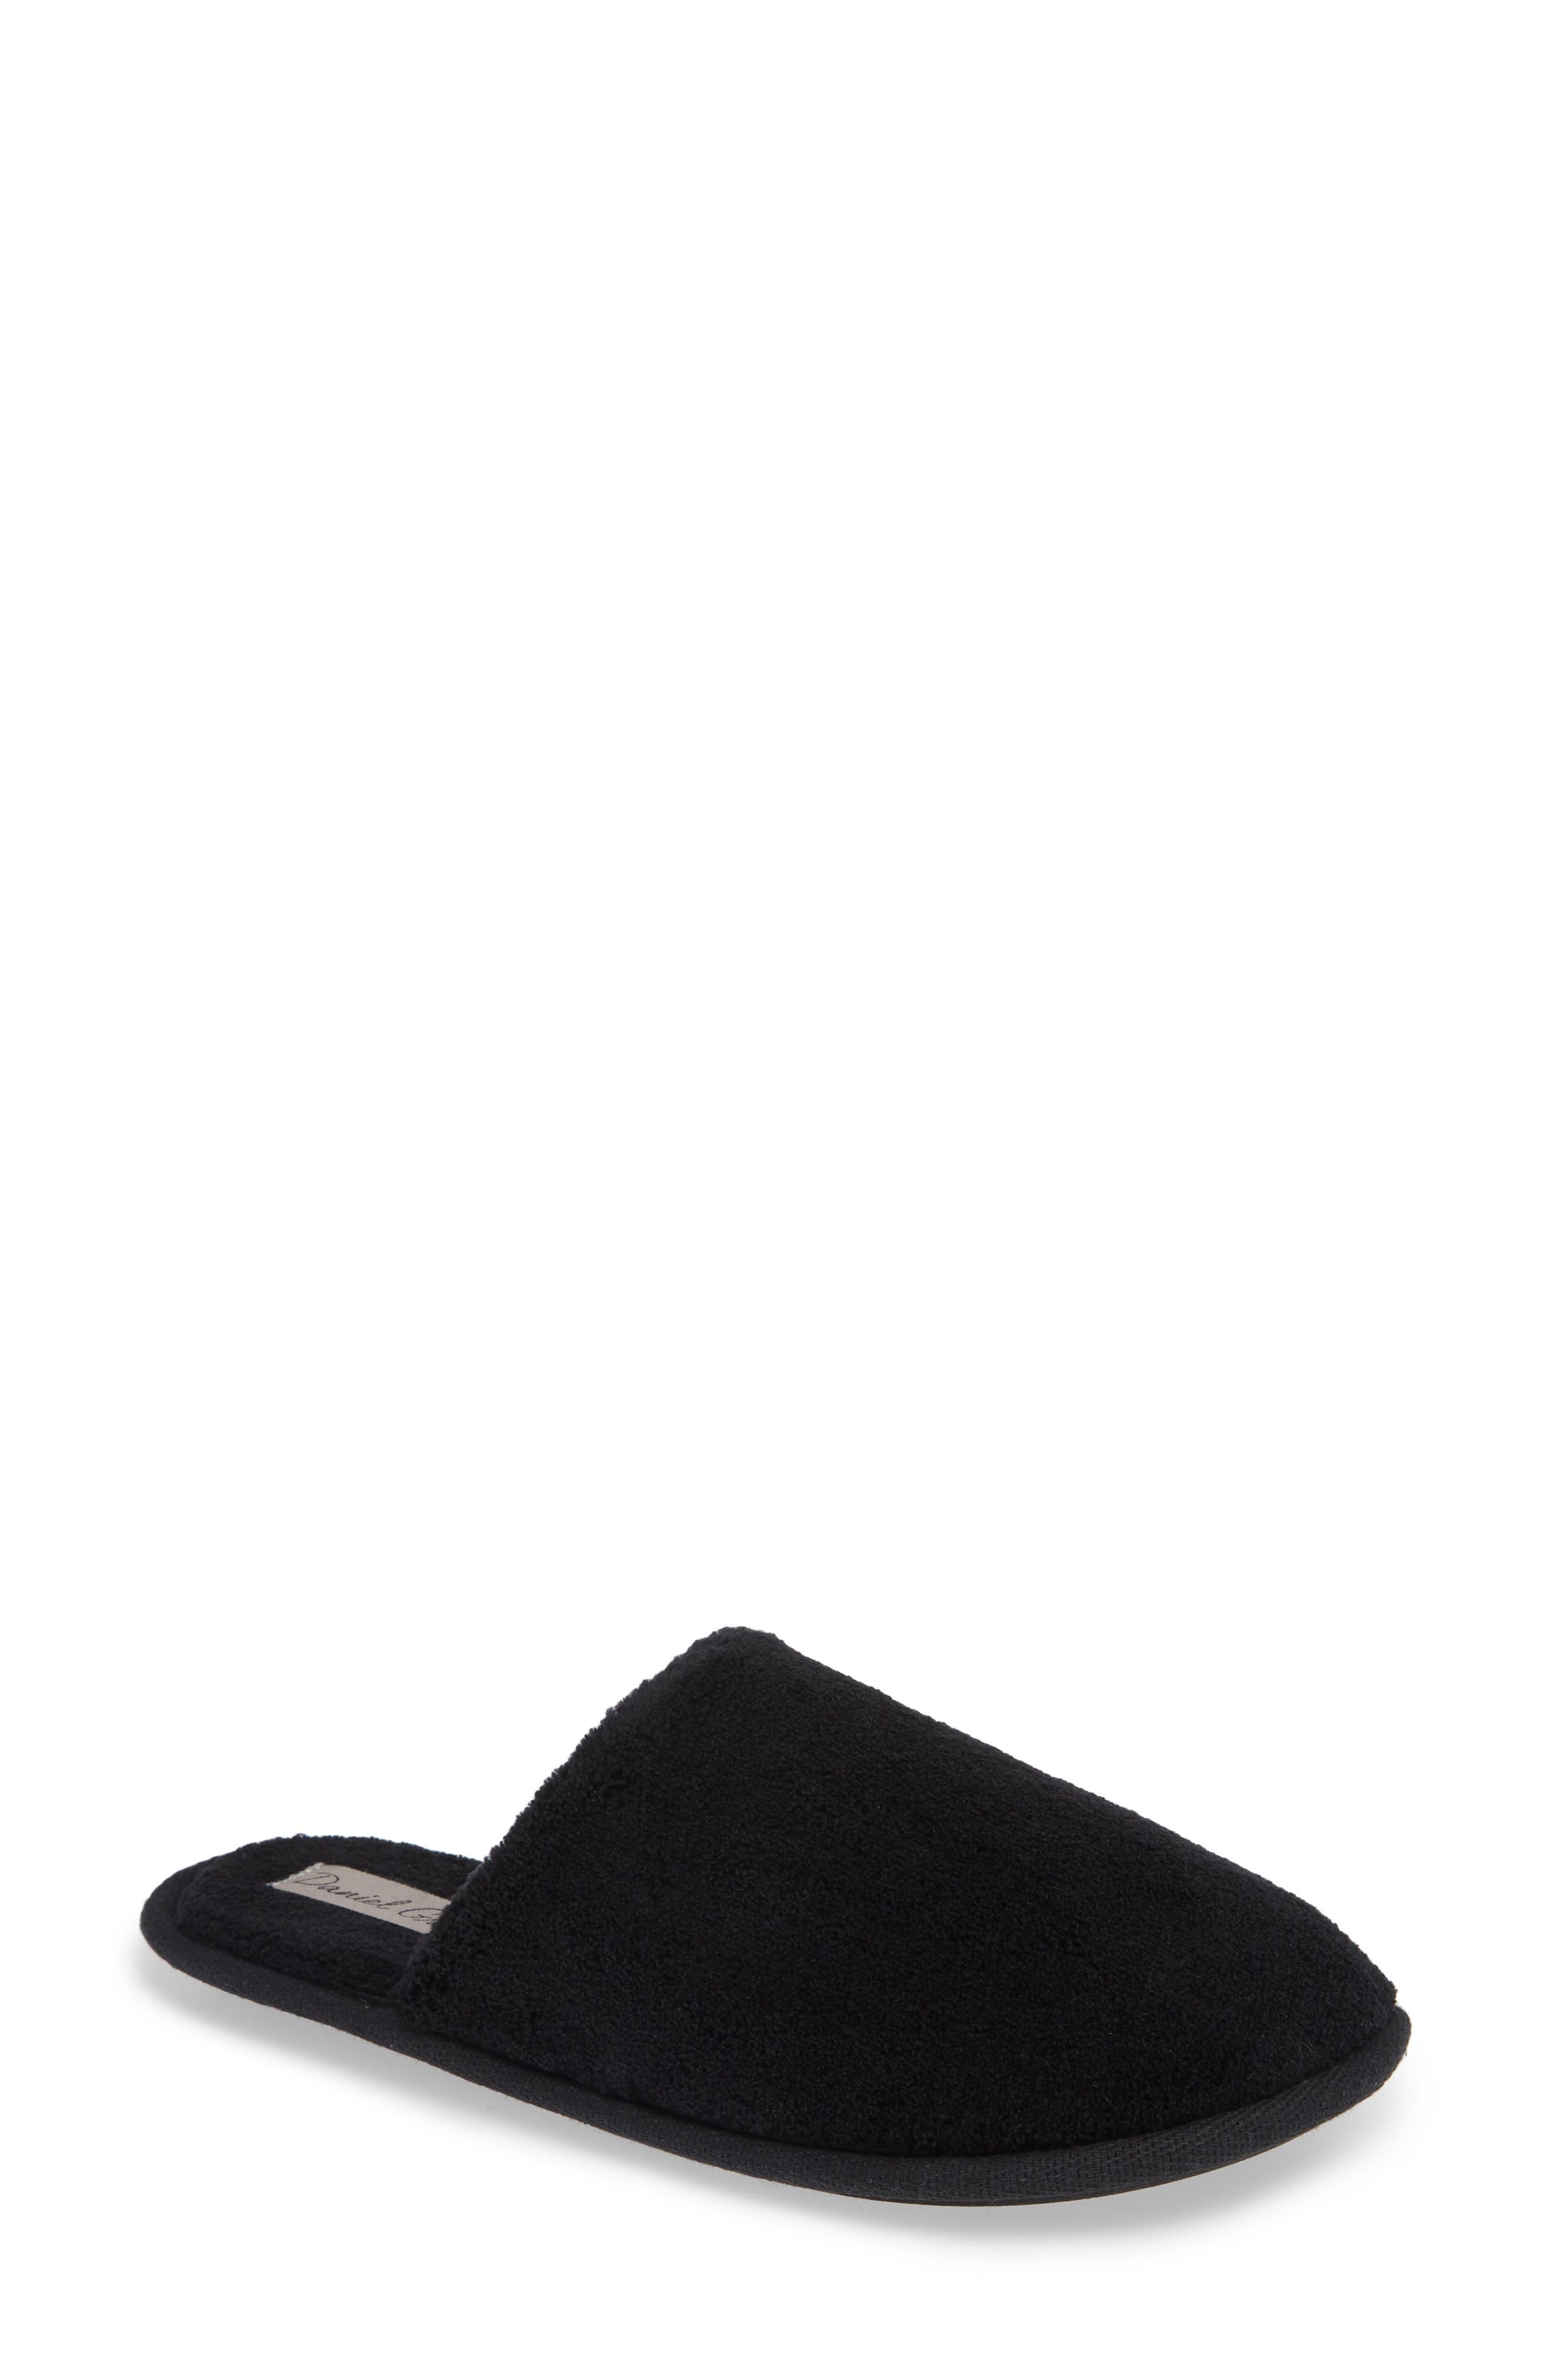 Rave II Slipper,                         Main,                         color, BLACK FABRIC